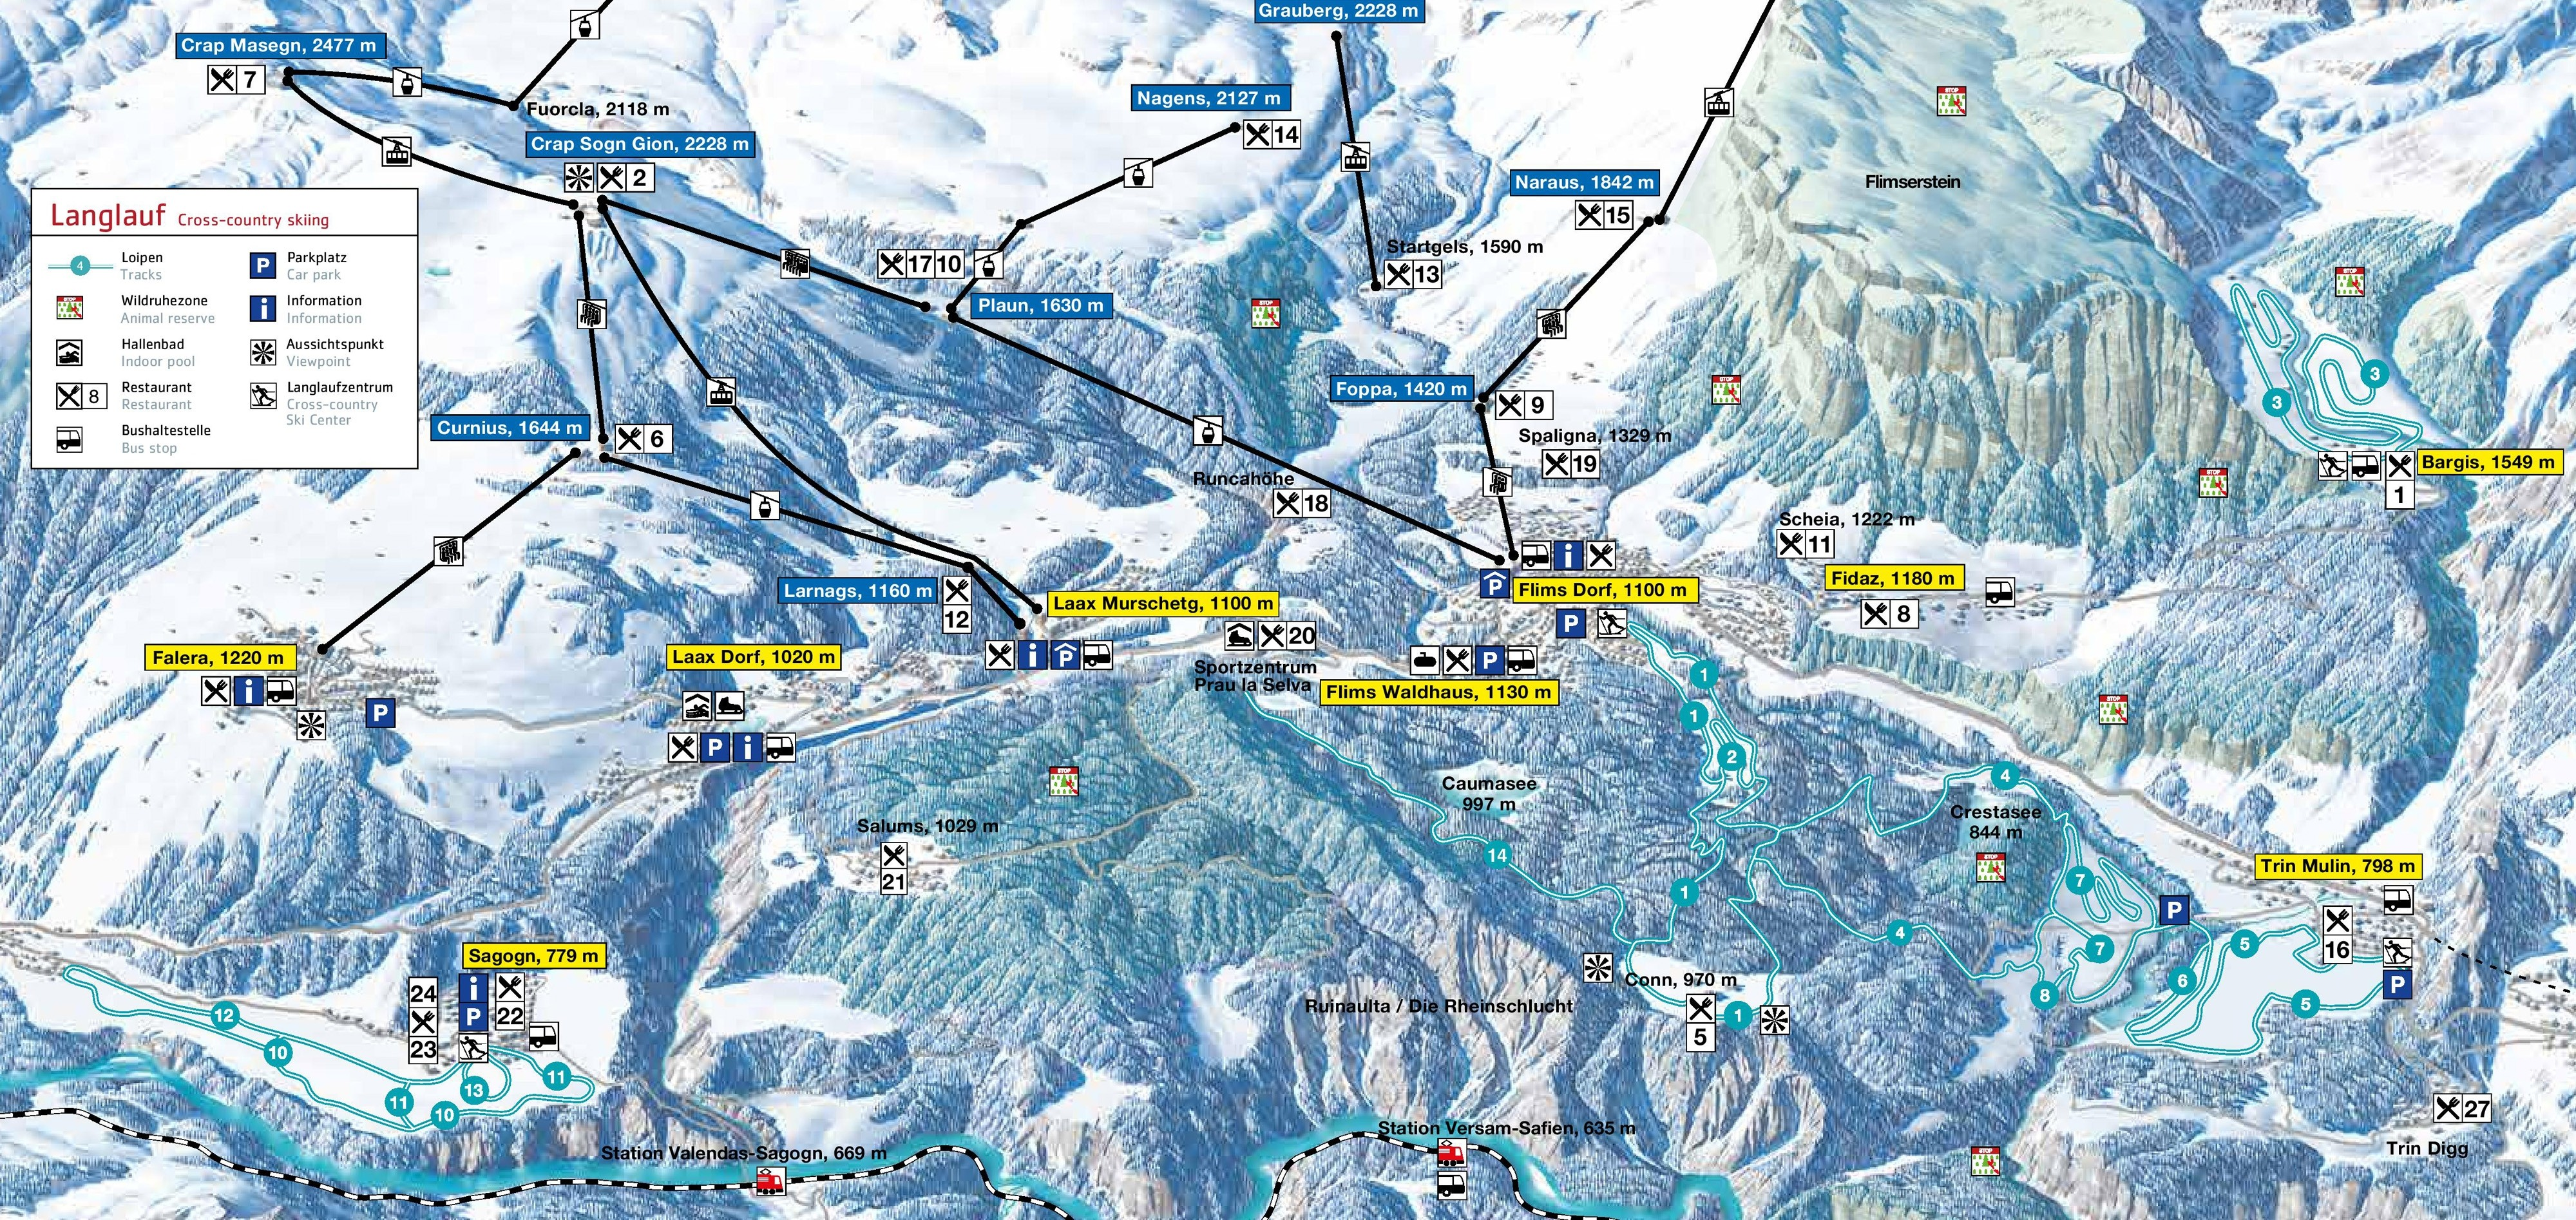 CrossCountry Skiing Flims Laax Falera Nordic skiing Tracks